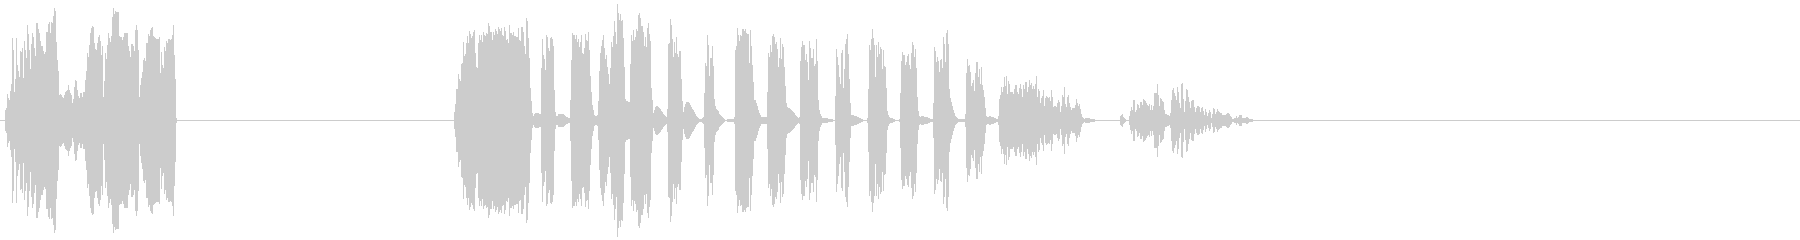 DJスキッドX2の未再生の波形